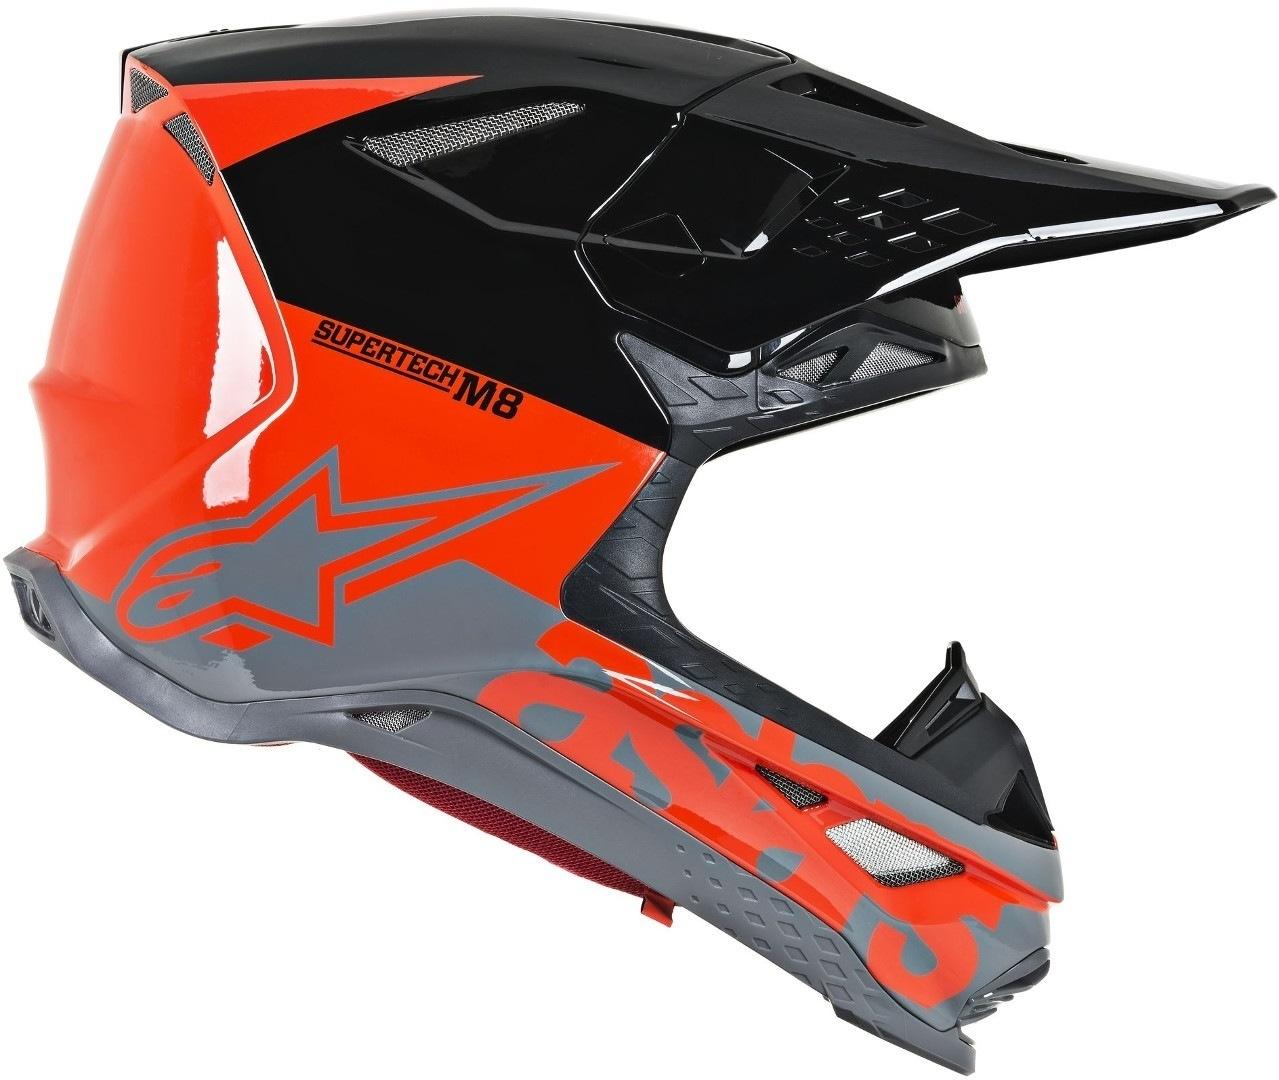 Casco cross Alpinestars Supertech S-M8 RADIUM Red Fluo Black mid Gray Glossy 2